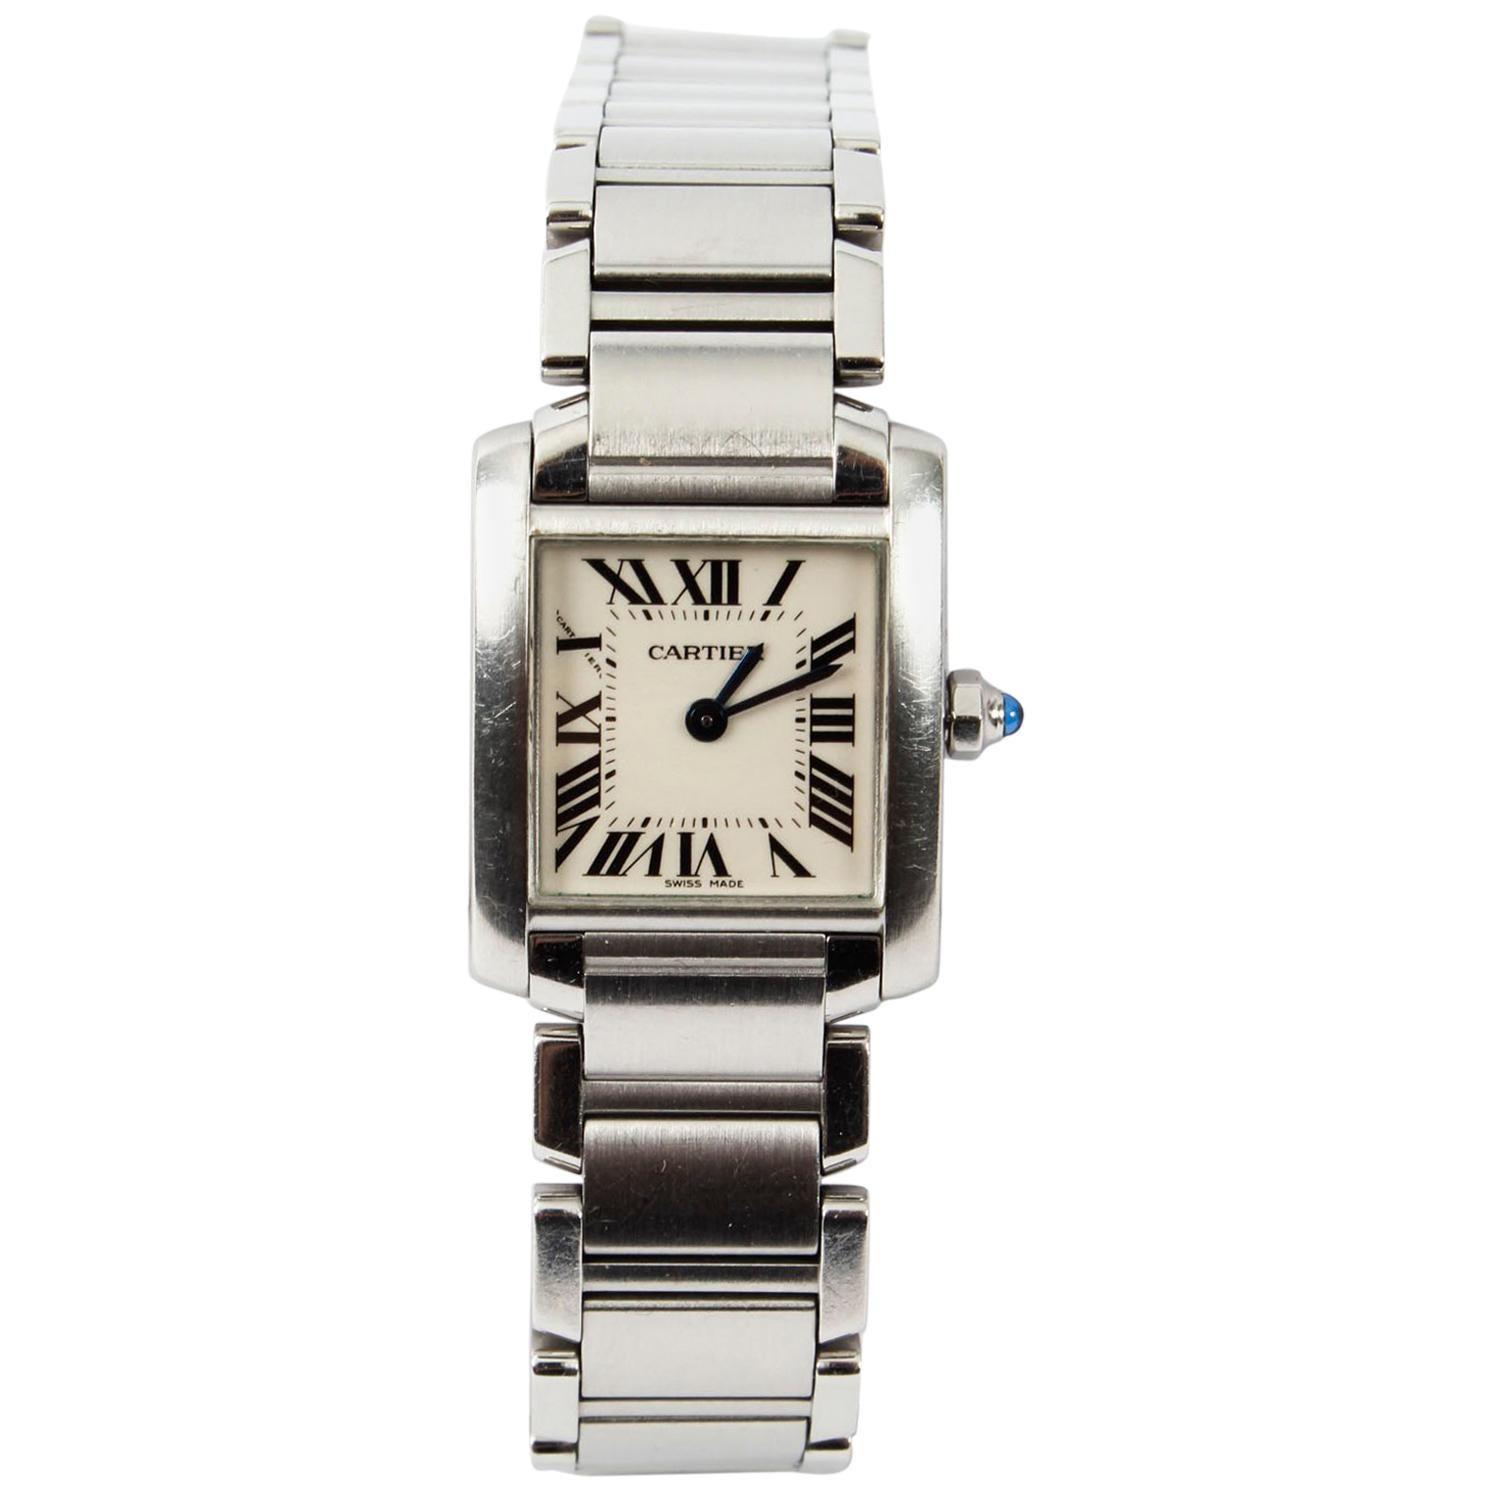 10a376ddf60 14-Karat White Gold Platinum and Diamonds Hamilton Vintage Ladies Wrist  Watch at 1stdibs